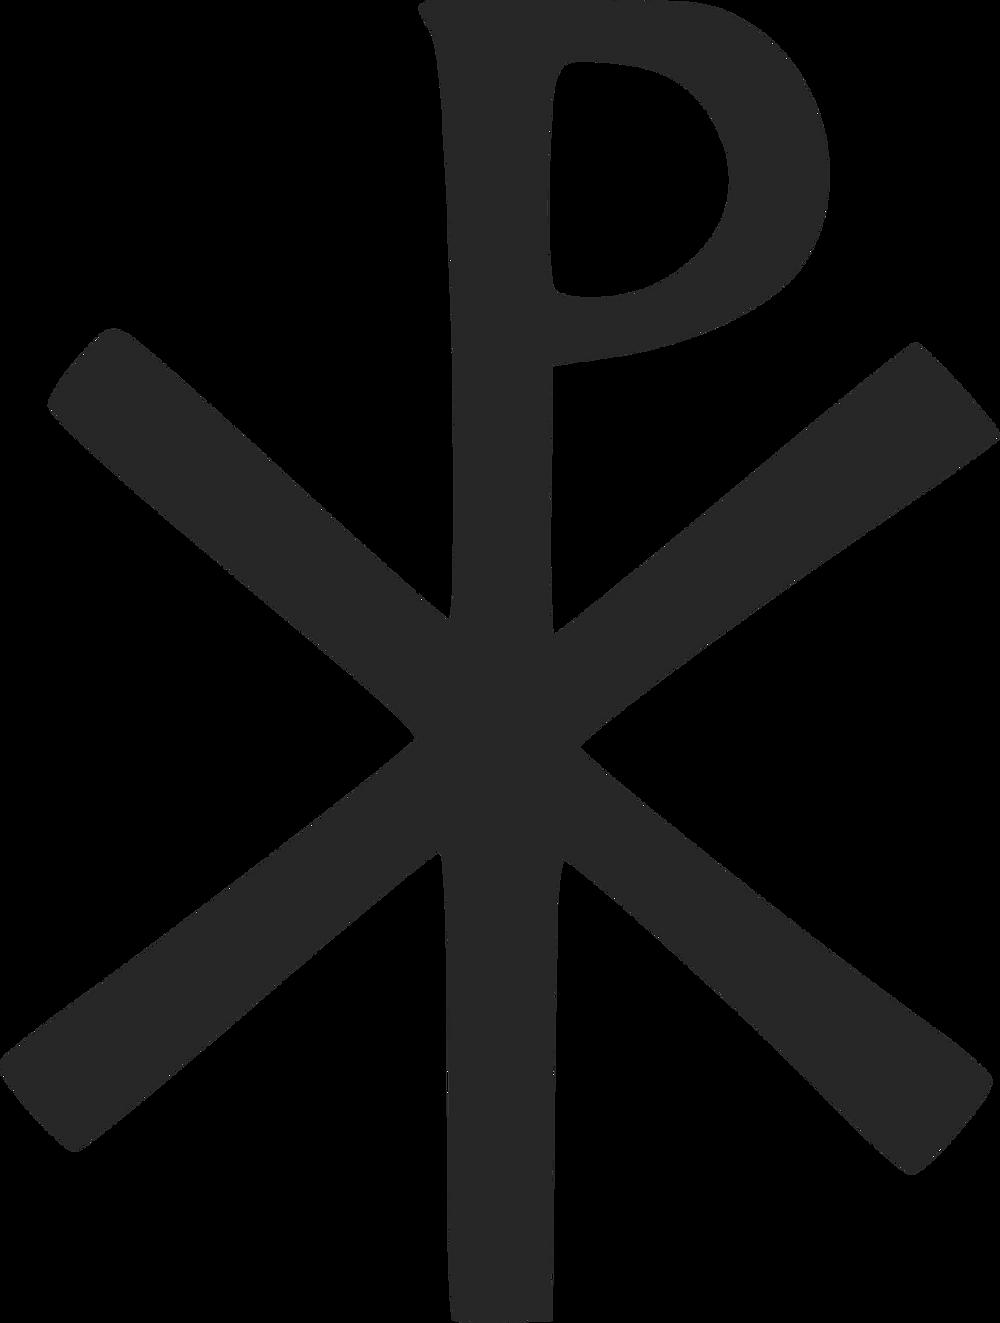 Símbolo Chi Rho